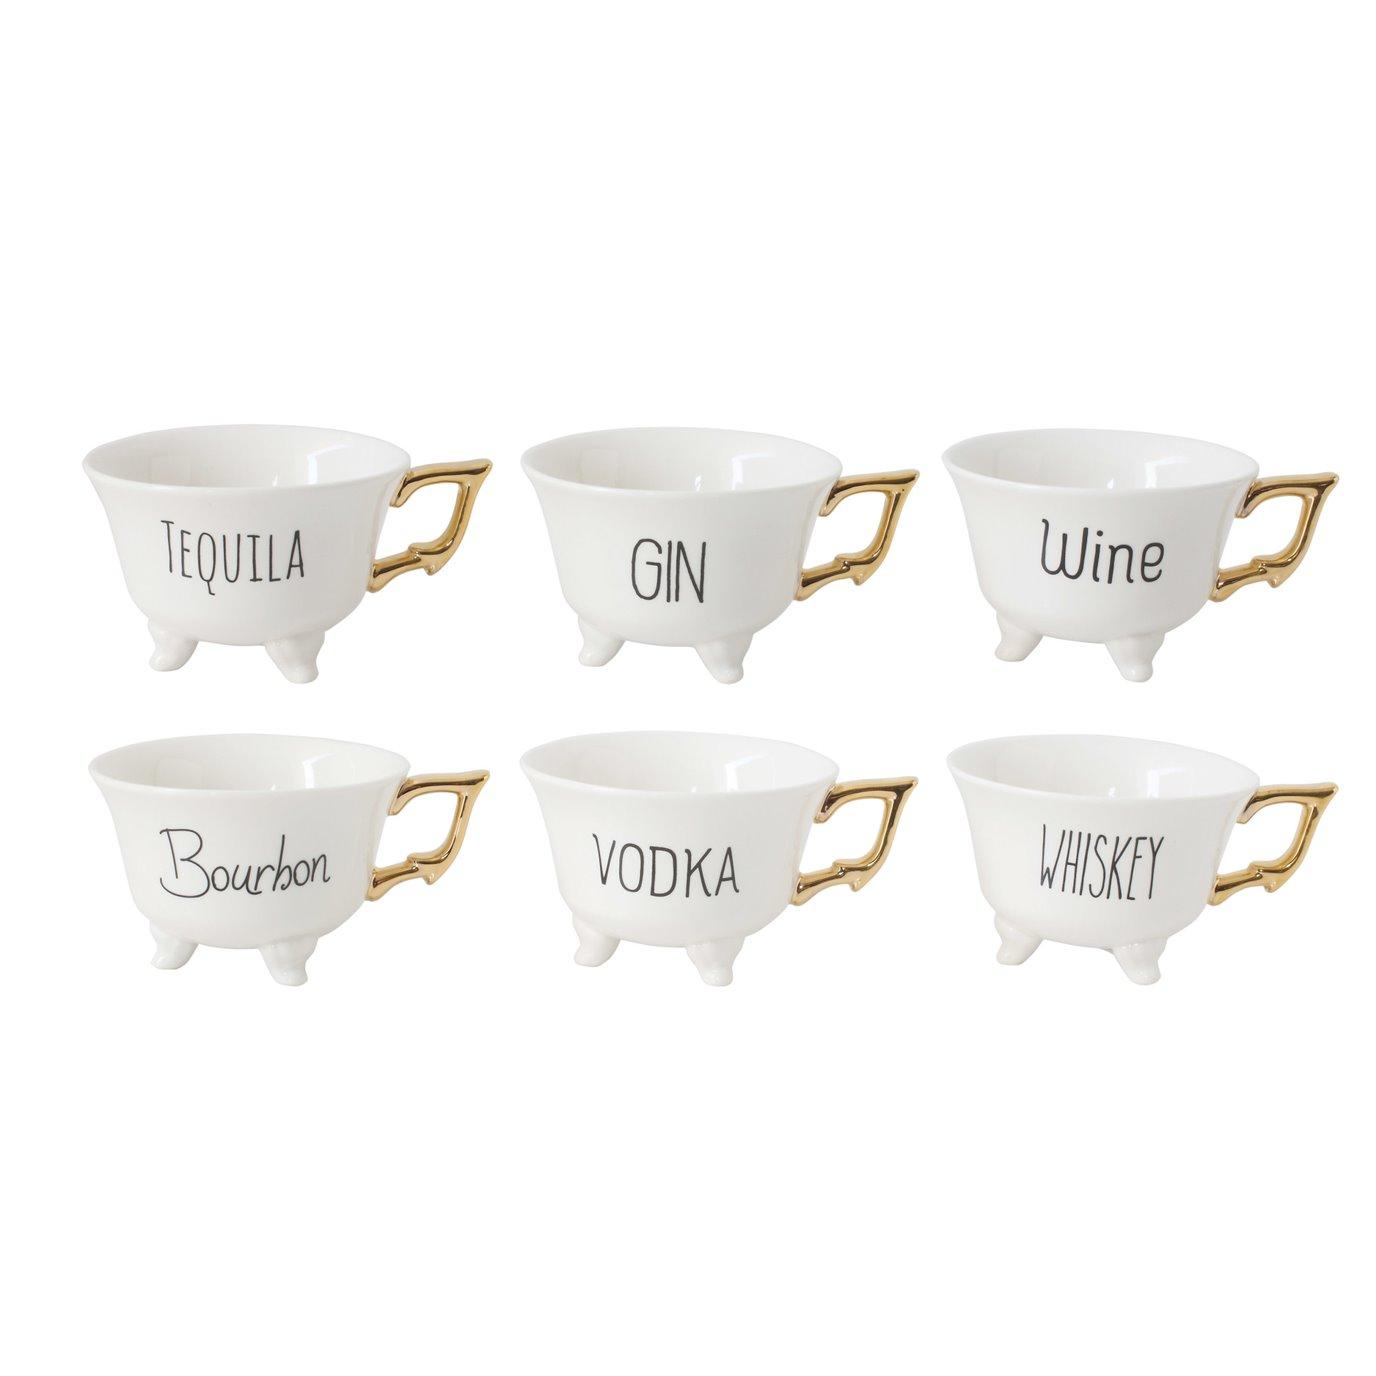 "Stoneware ""Liquor"" Mugs with Gold Electroplating (Set of 6 Designs)"